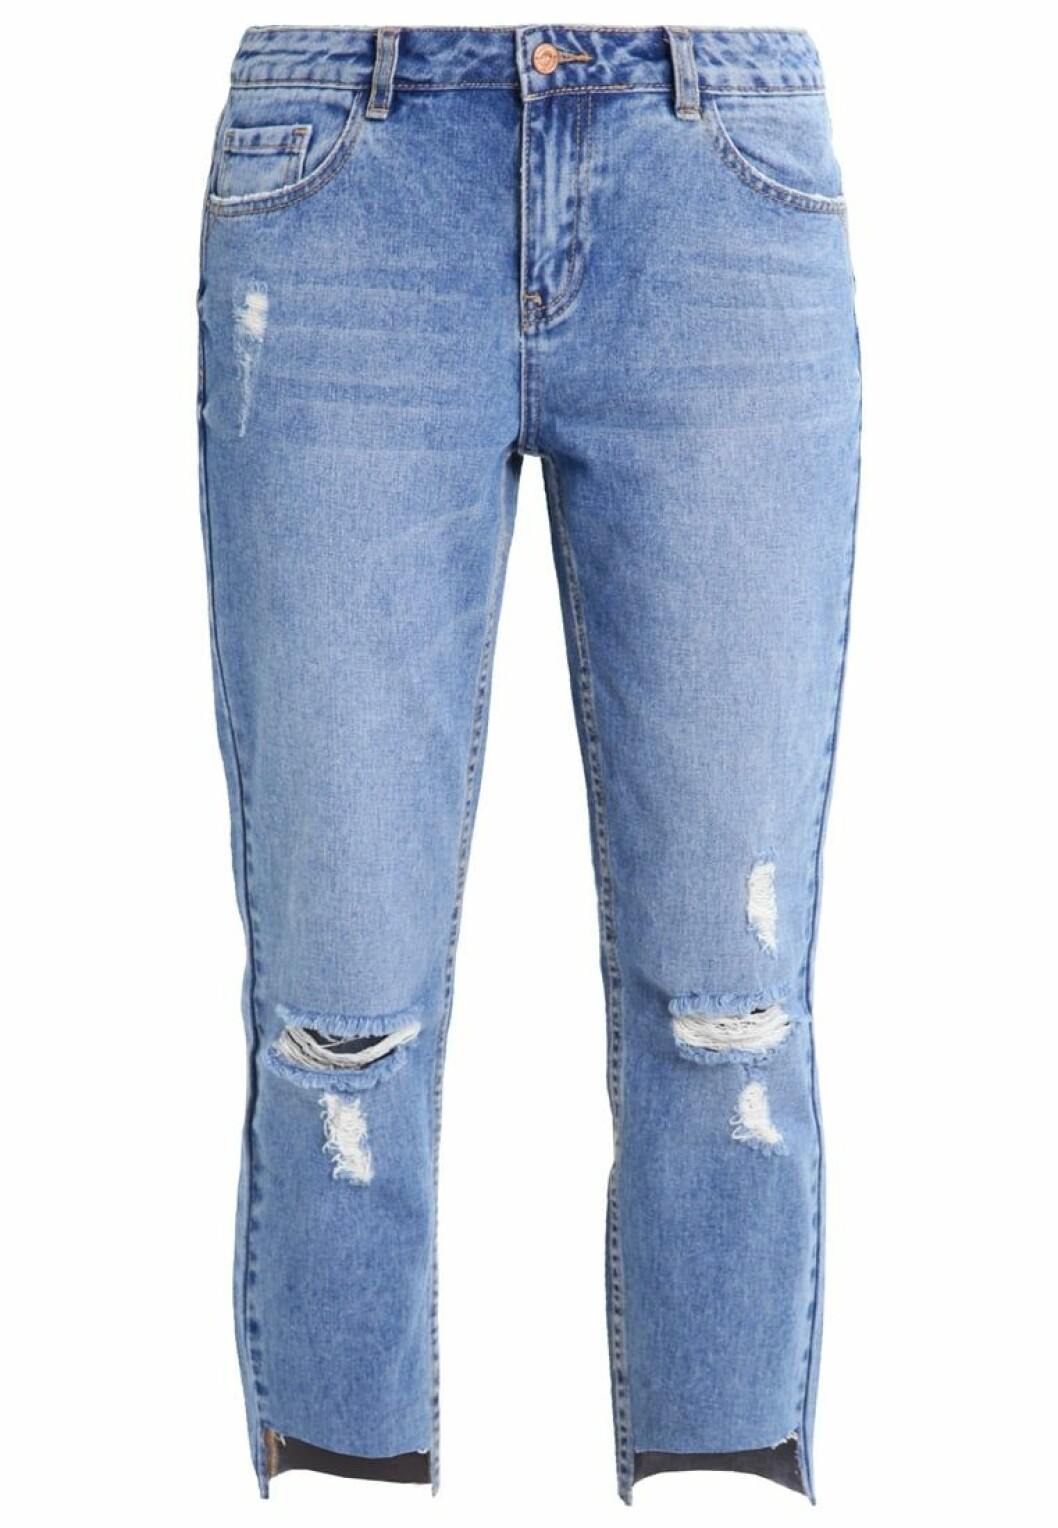 avklippta jeans 2017